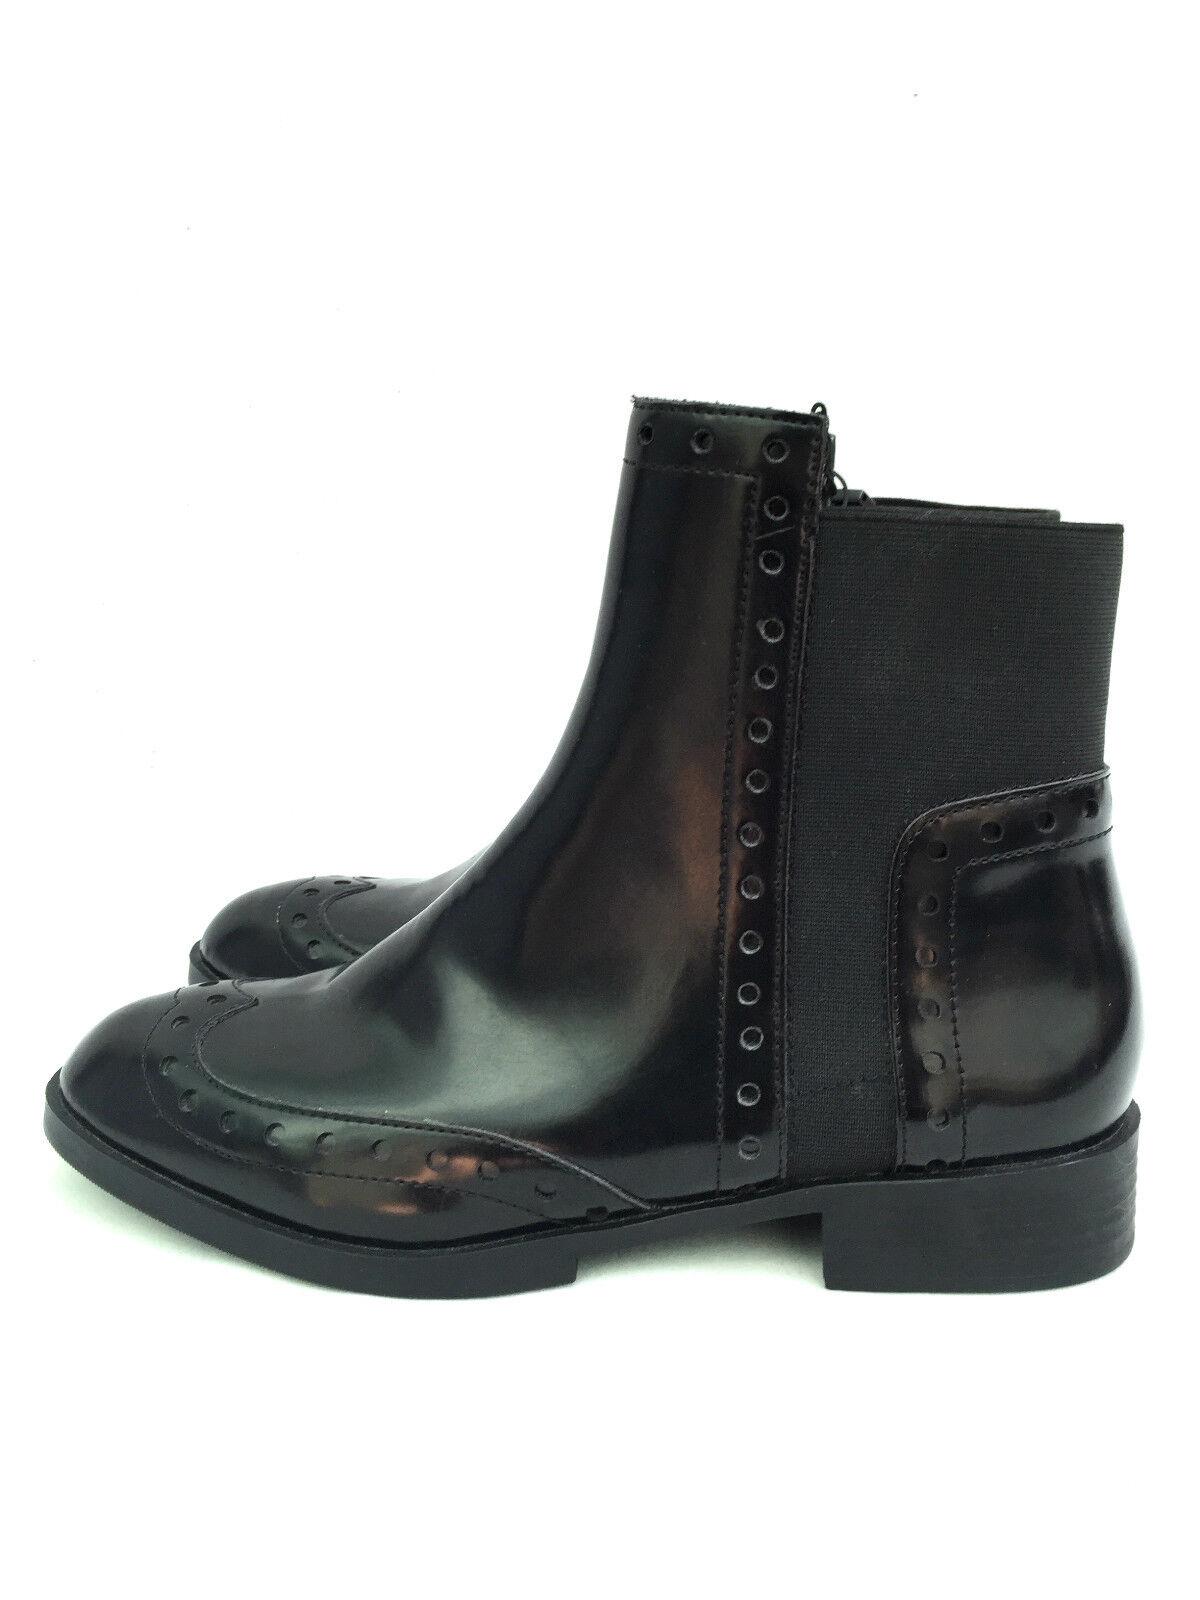 ZARA ANKLE US10 Stiefel SIZE UK8 EUR41 US10 ANKLE REF 2150 001 Damenschuhe BLACK Schuhe 90f7b0